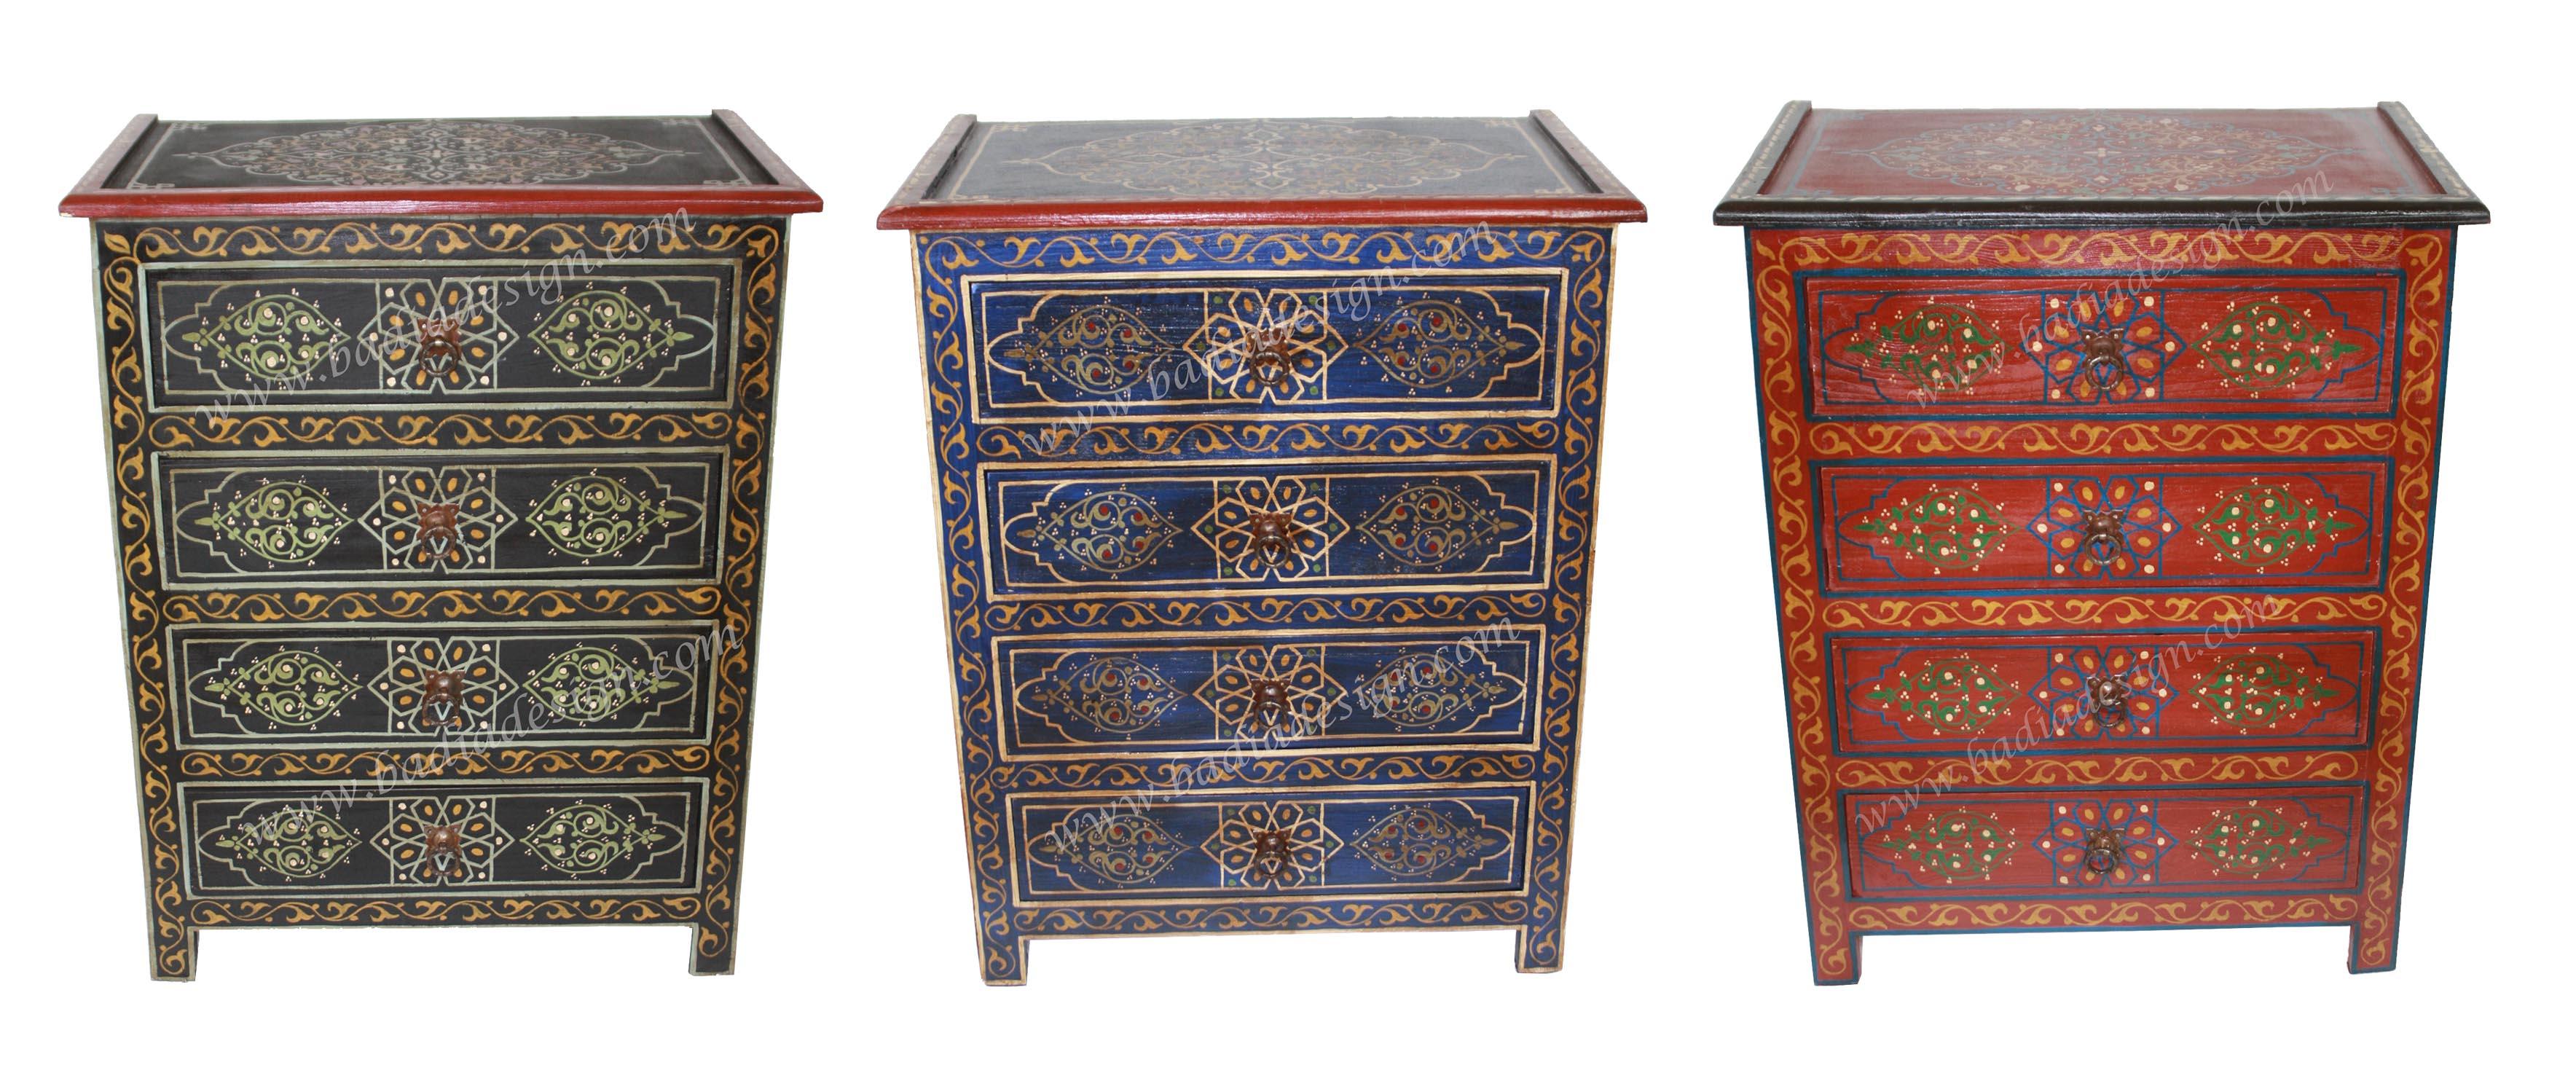 moroccan-hand-painted-nightstand-hp-ns009.jpg